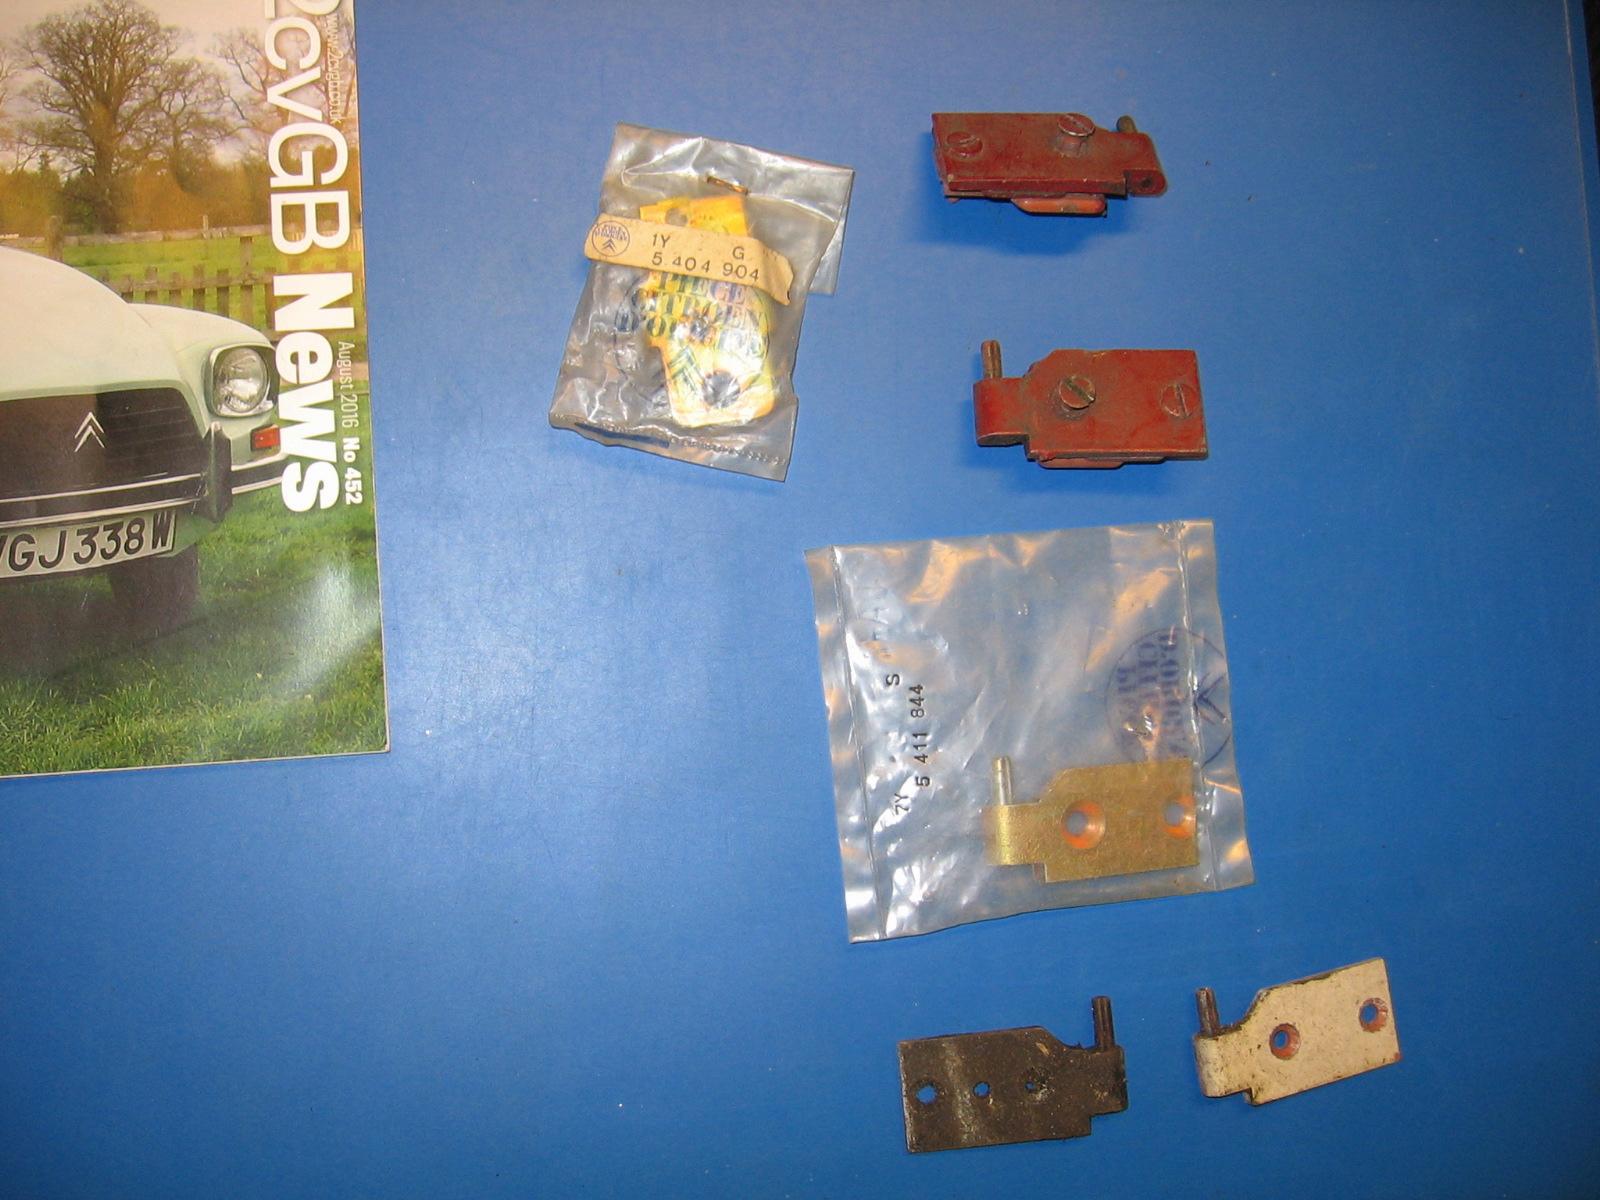 OD0409 deurscharnierplaatjes Dyane